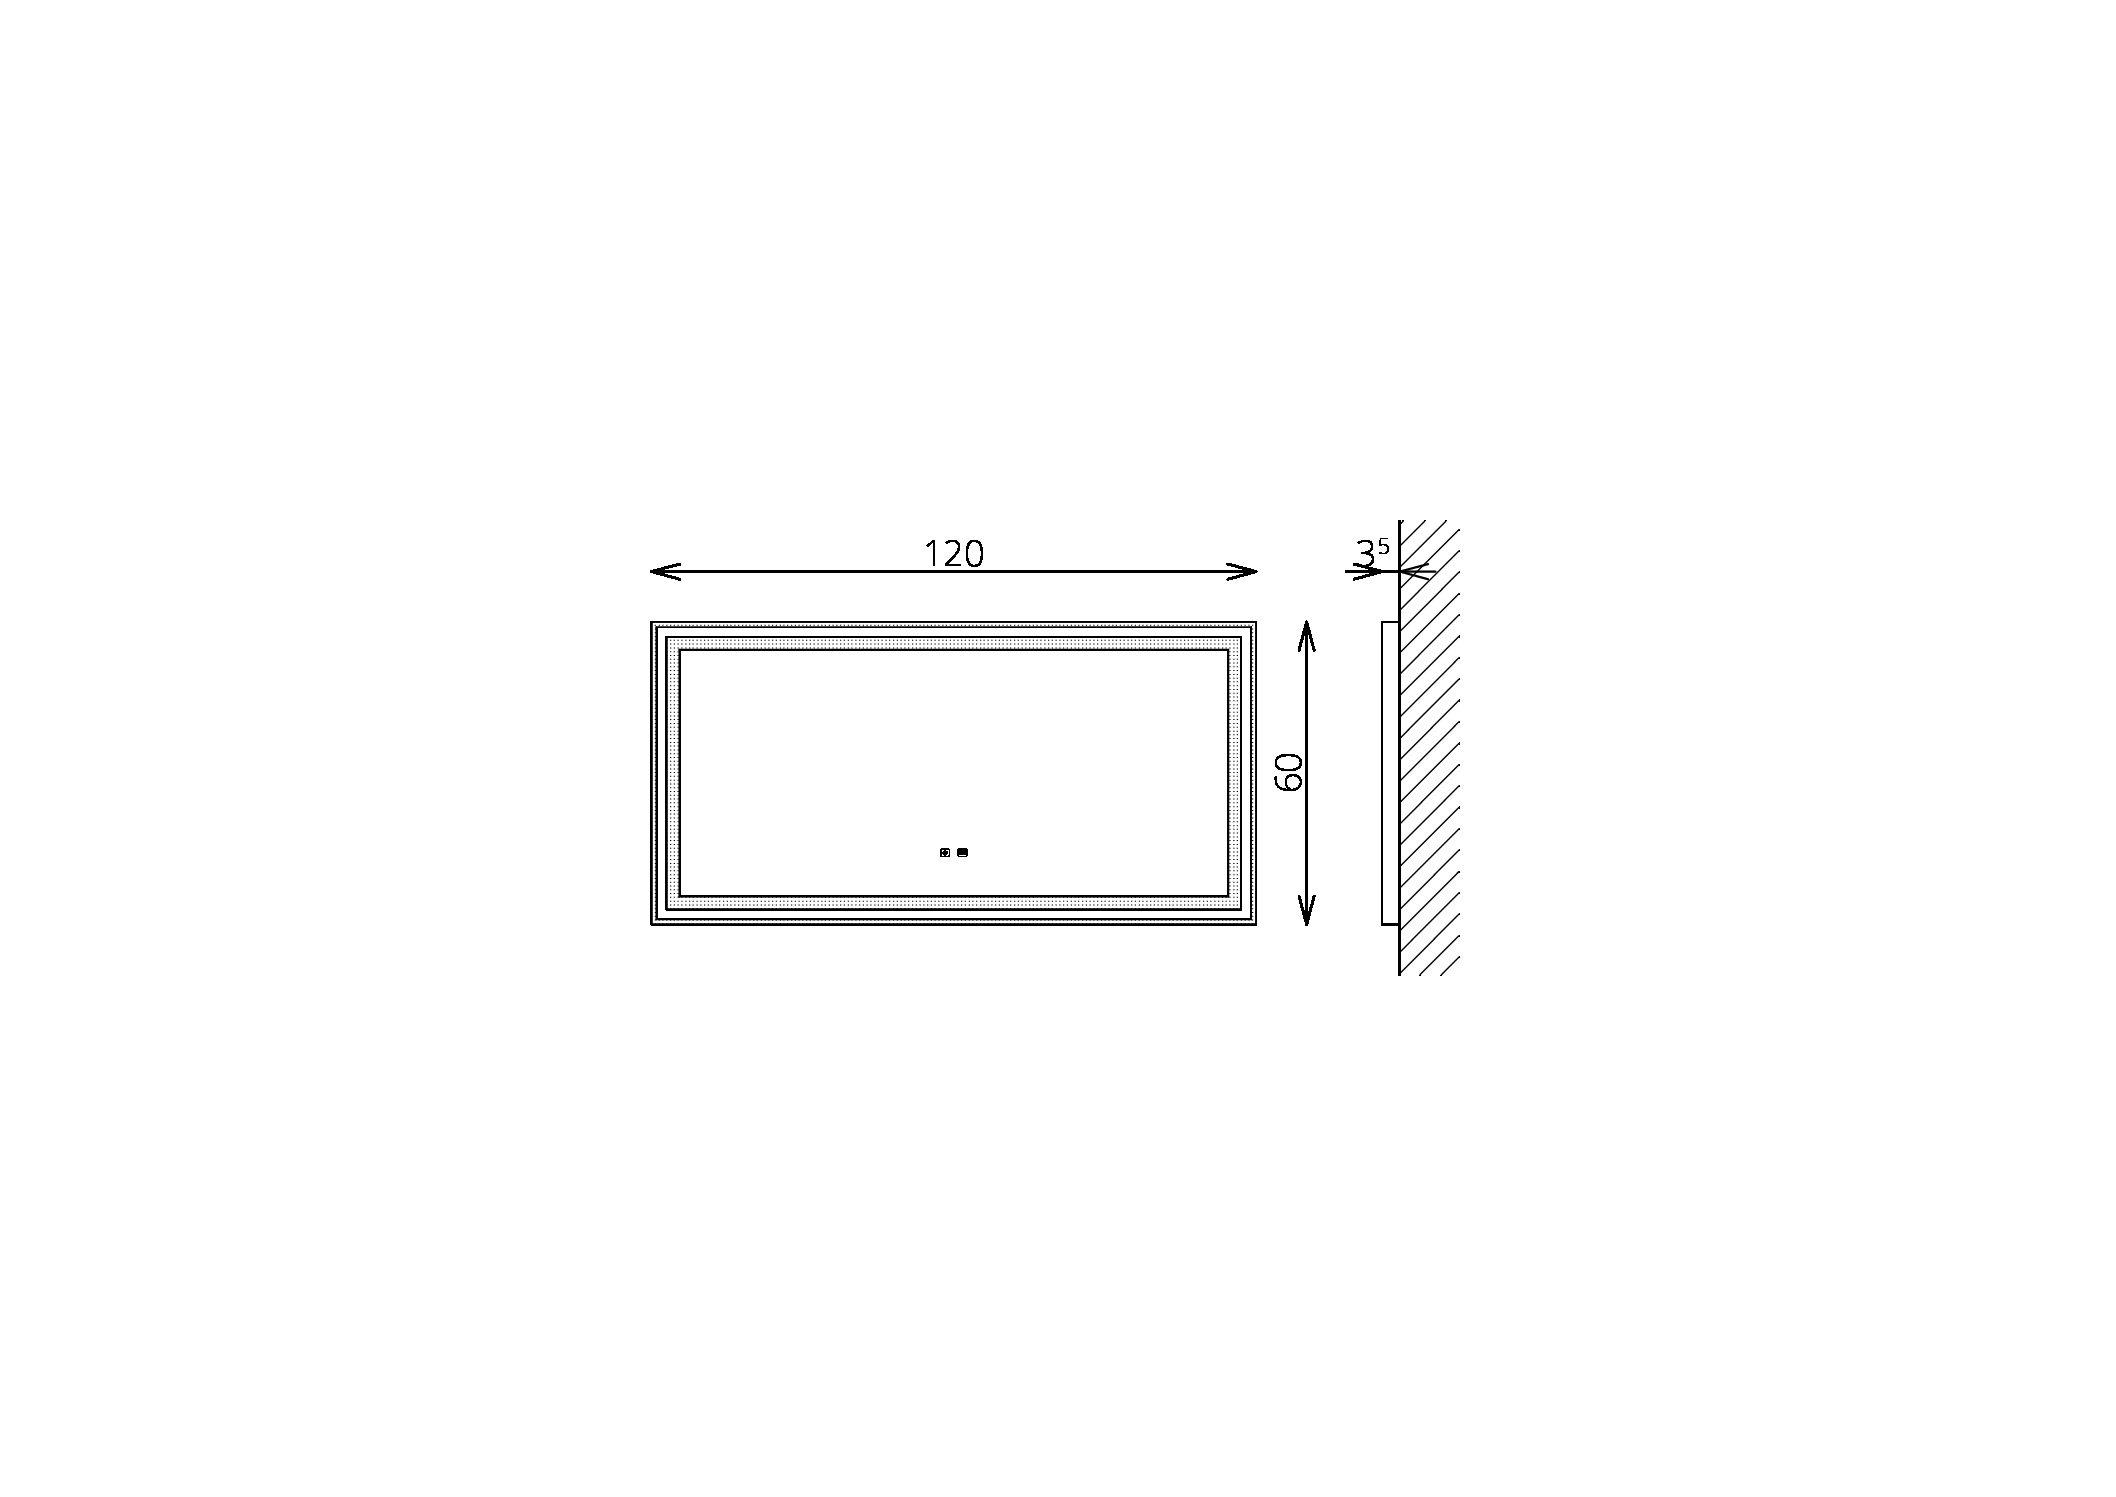 TBOSS-FLOATING-MIRROR-AURA-120x60